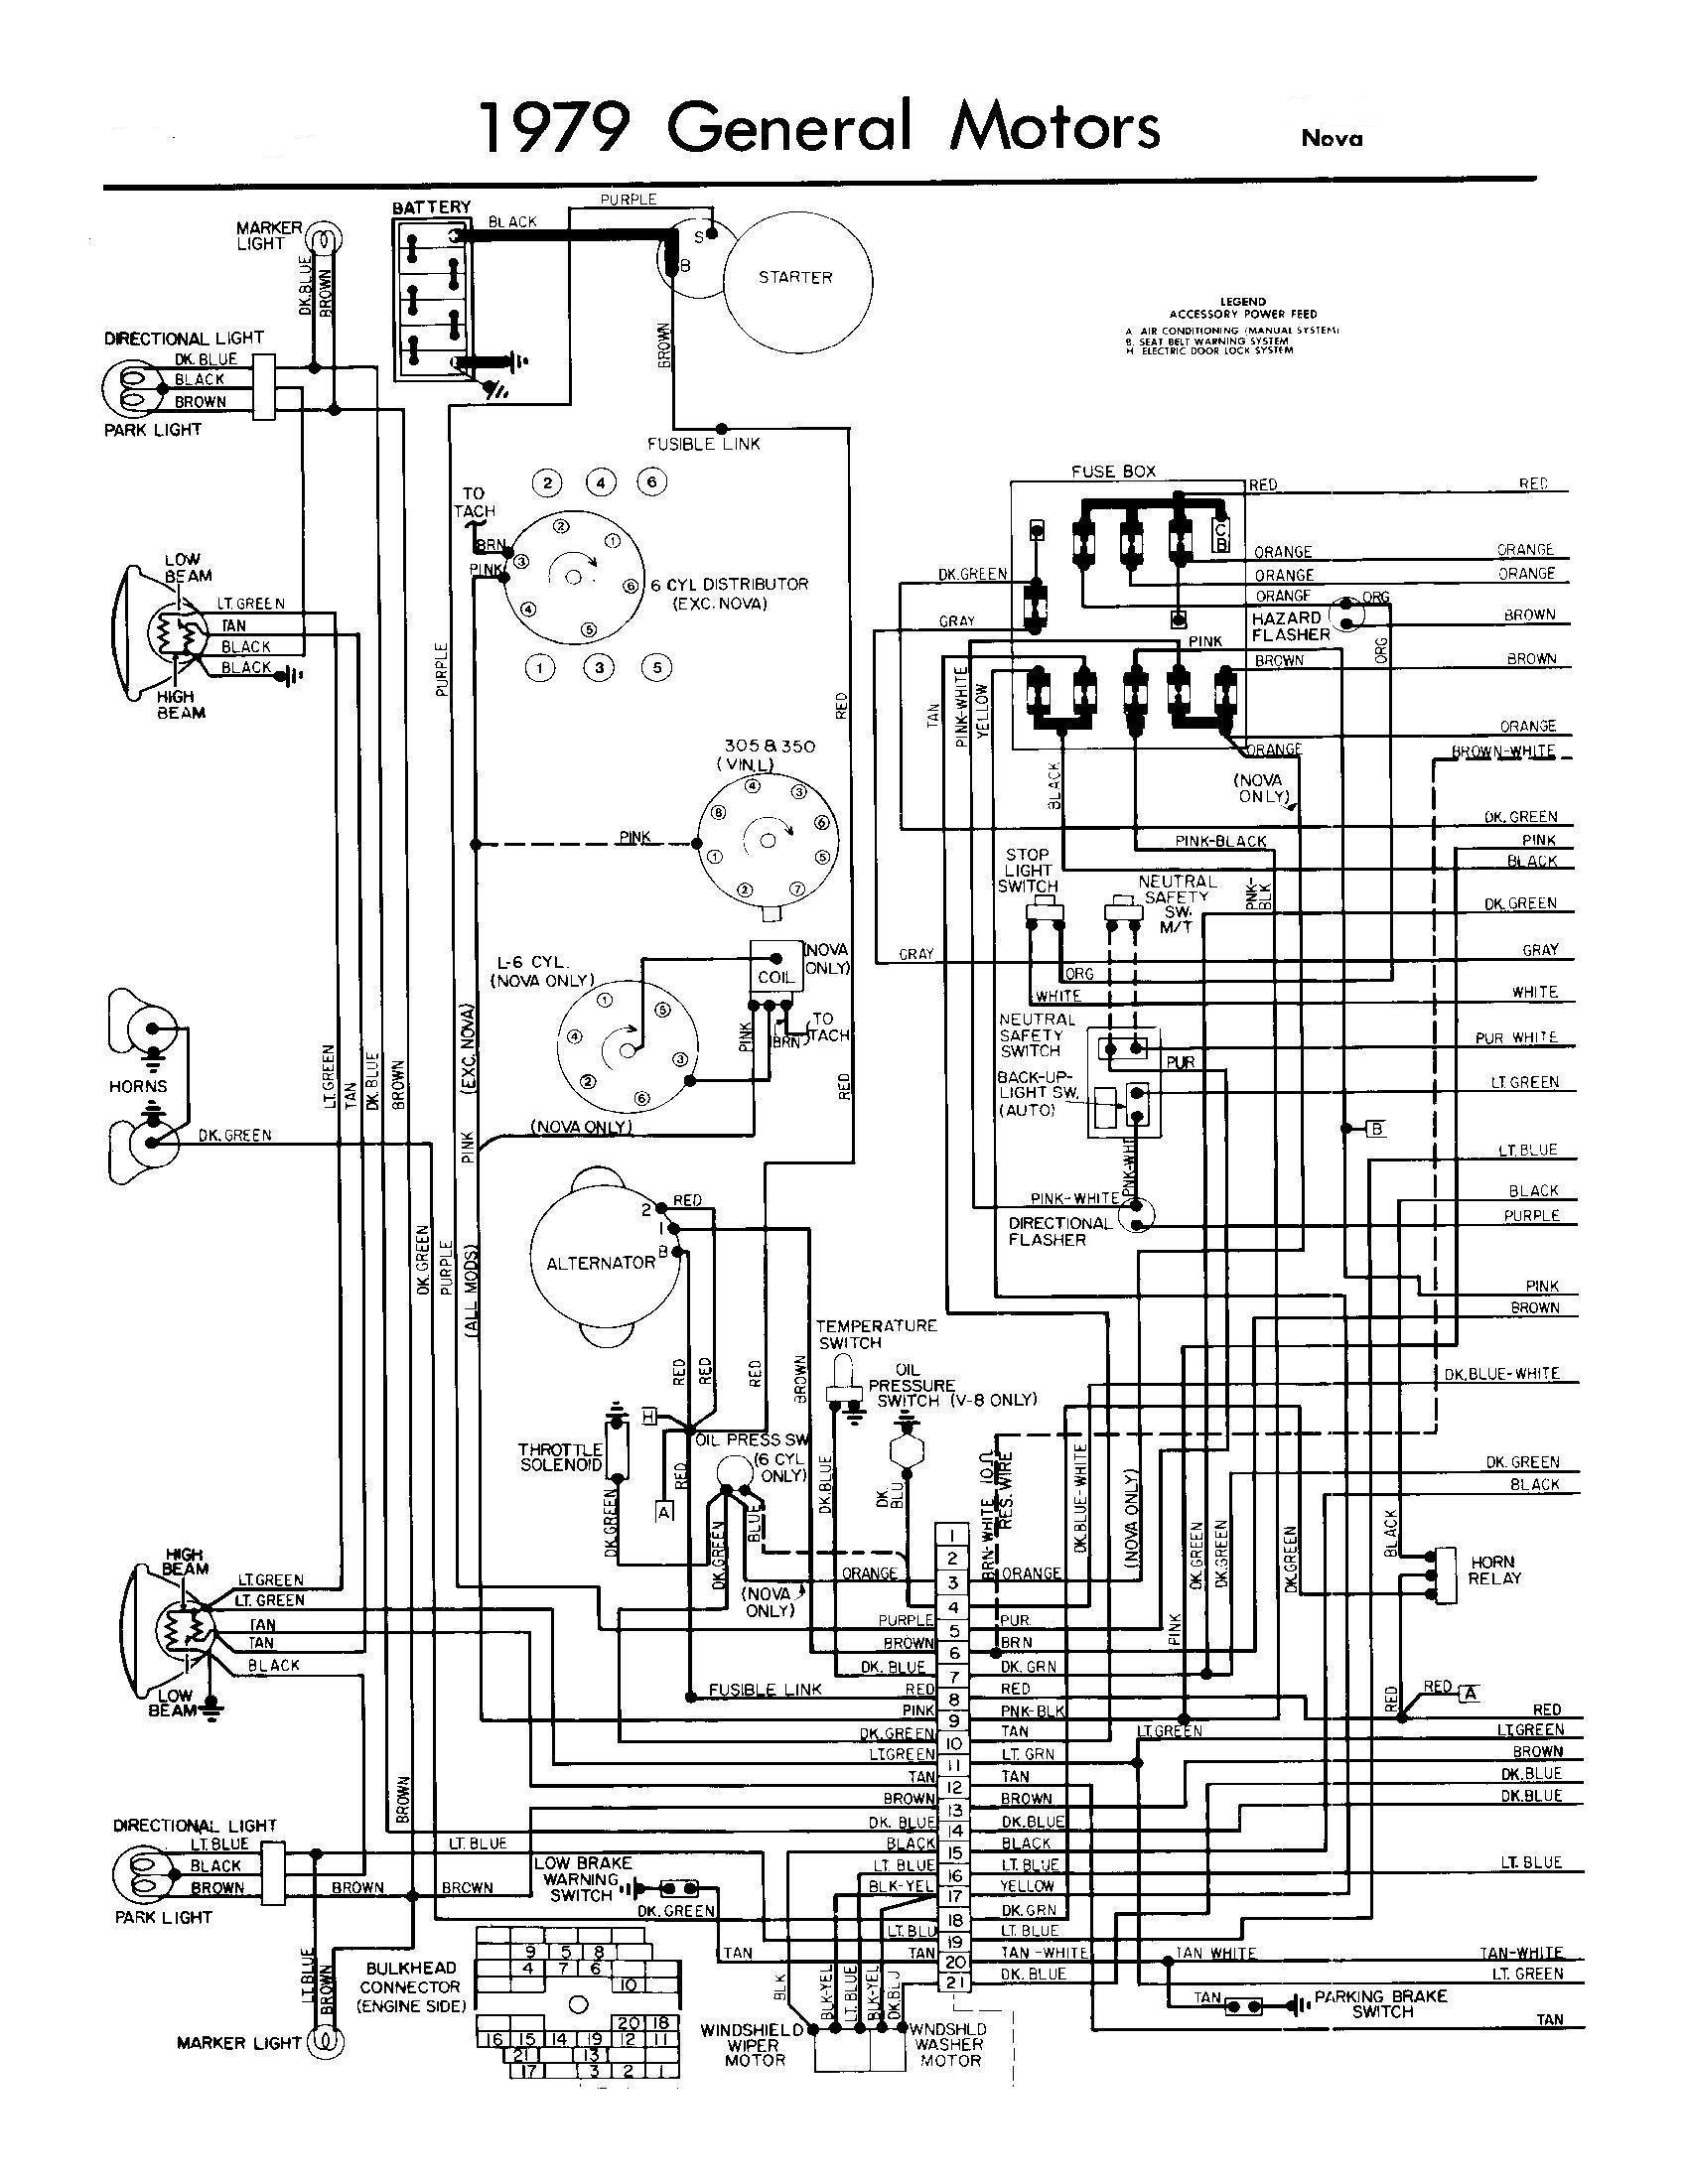 Engine Wiring Diagrams All Generation Wiring Schematics Chevy Nova forum Of Engine Wiring Diagrams